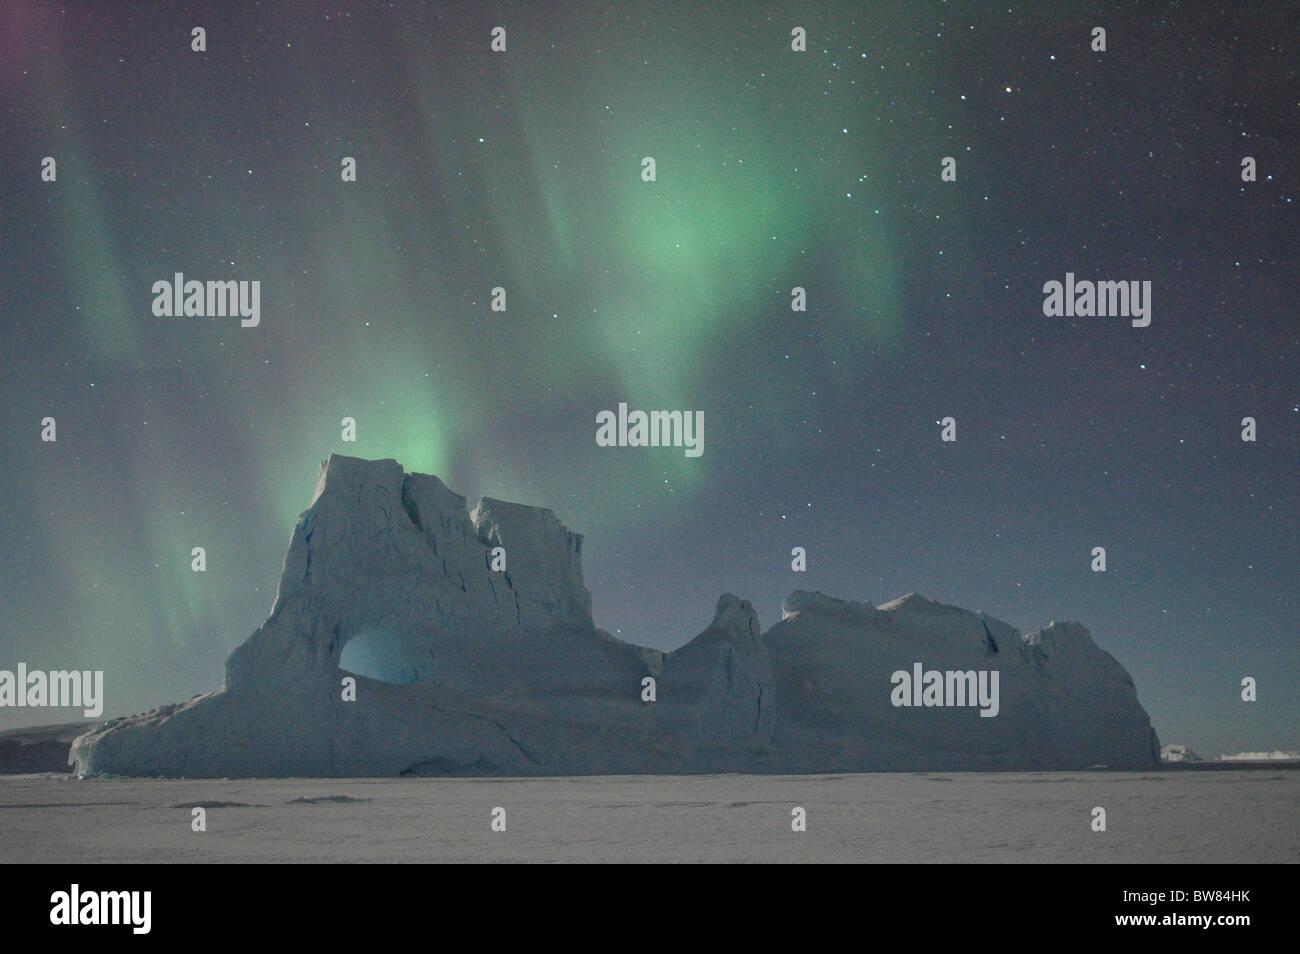 Southern lights, Aurora australis, over antarctic landscape, Antarctica - Stock Image